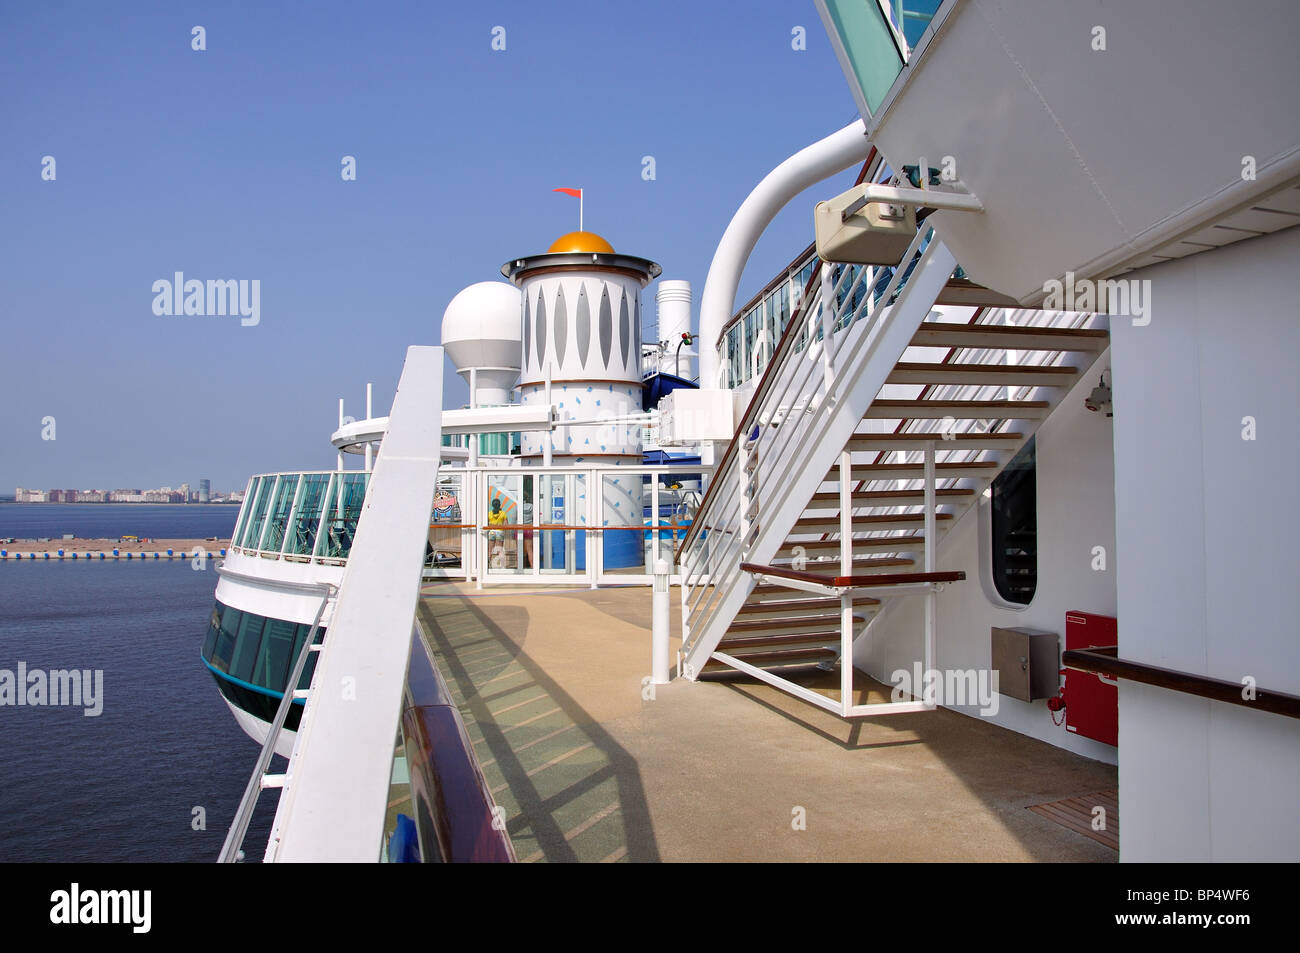 Sundeck, Royal Caribbean Cruises 'Jewel of the Seas' Cruise Ship, Baltic Sea, Europe - Stock Image